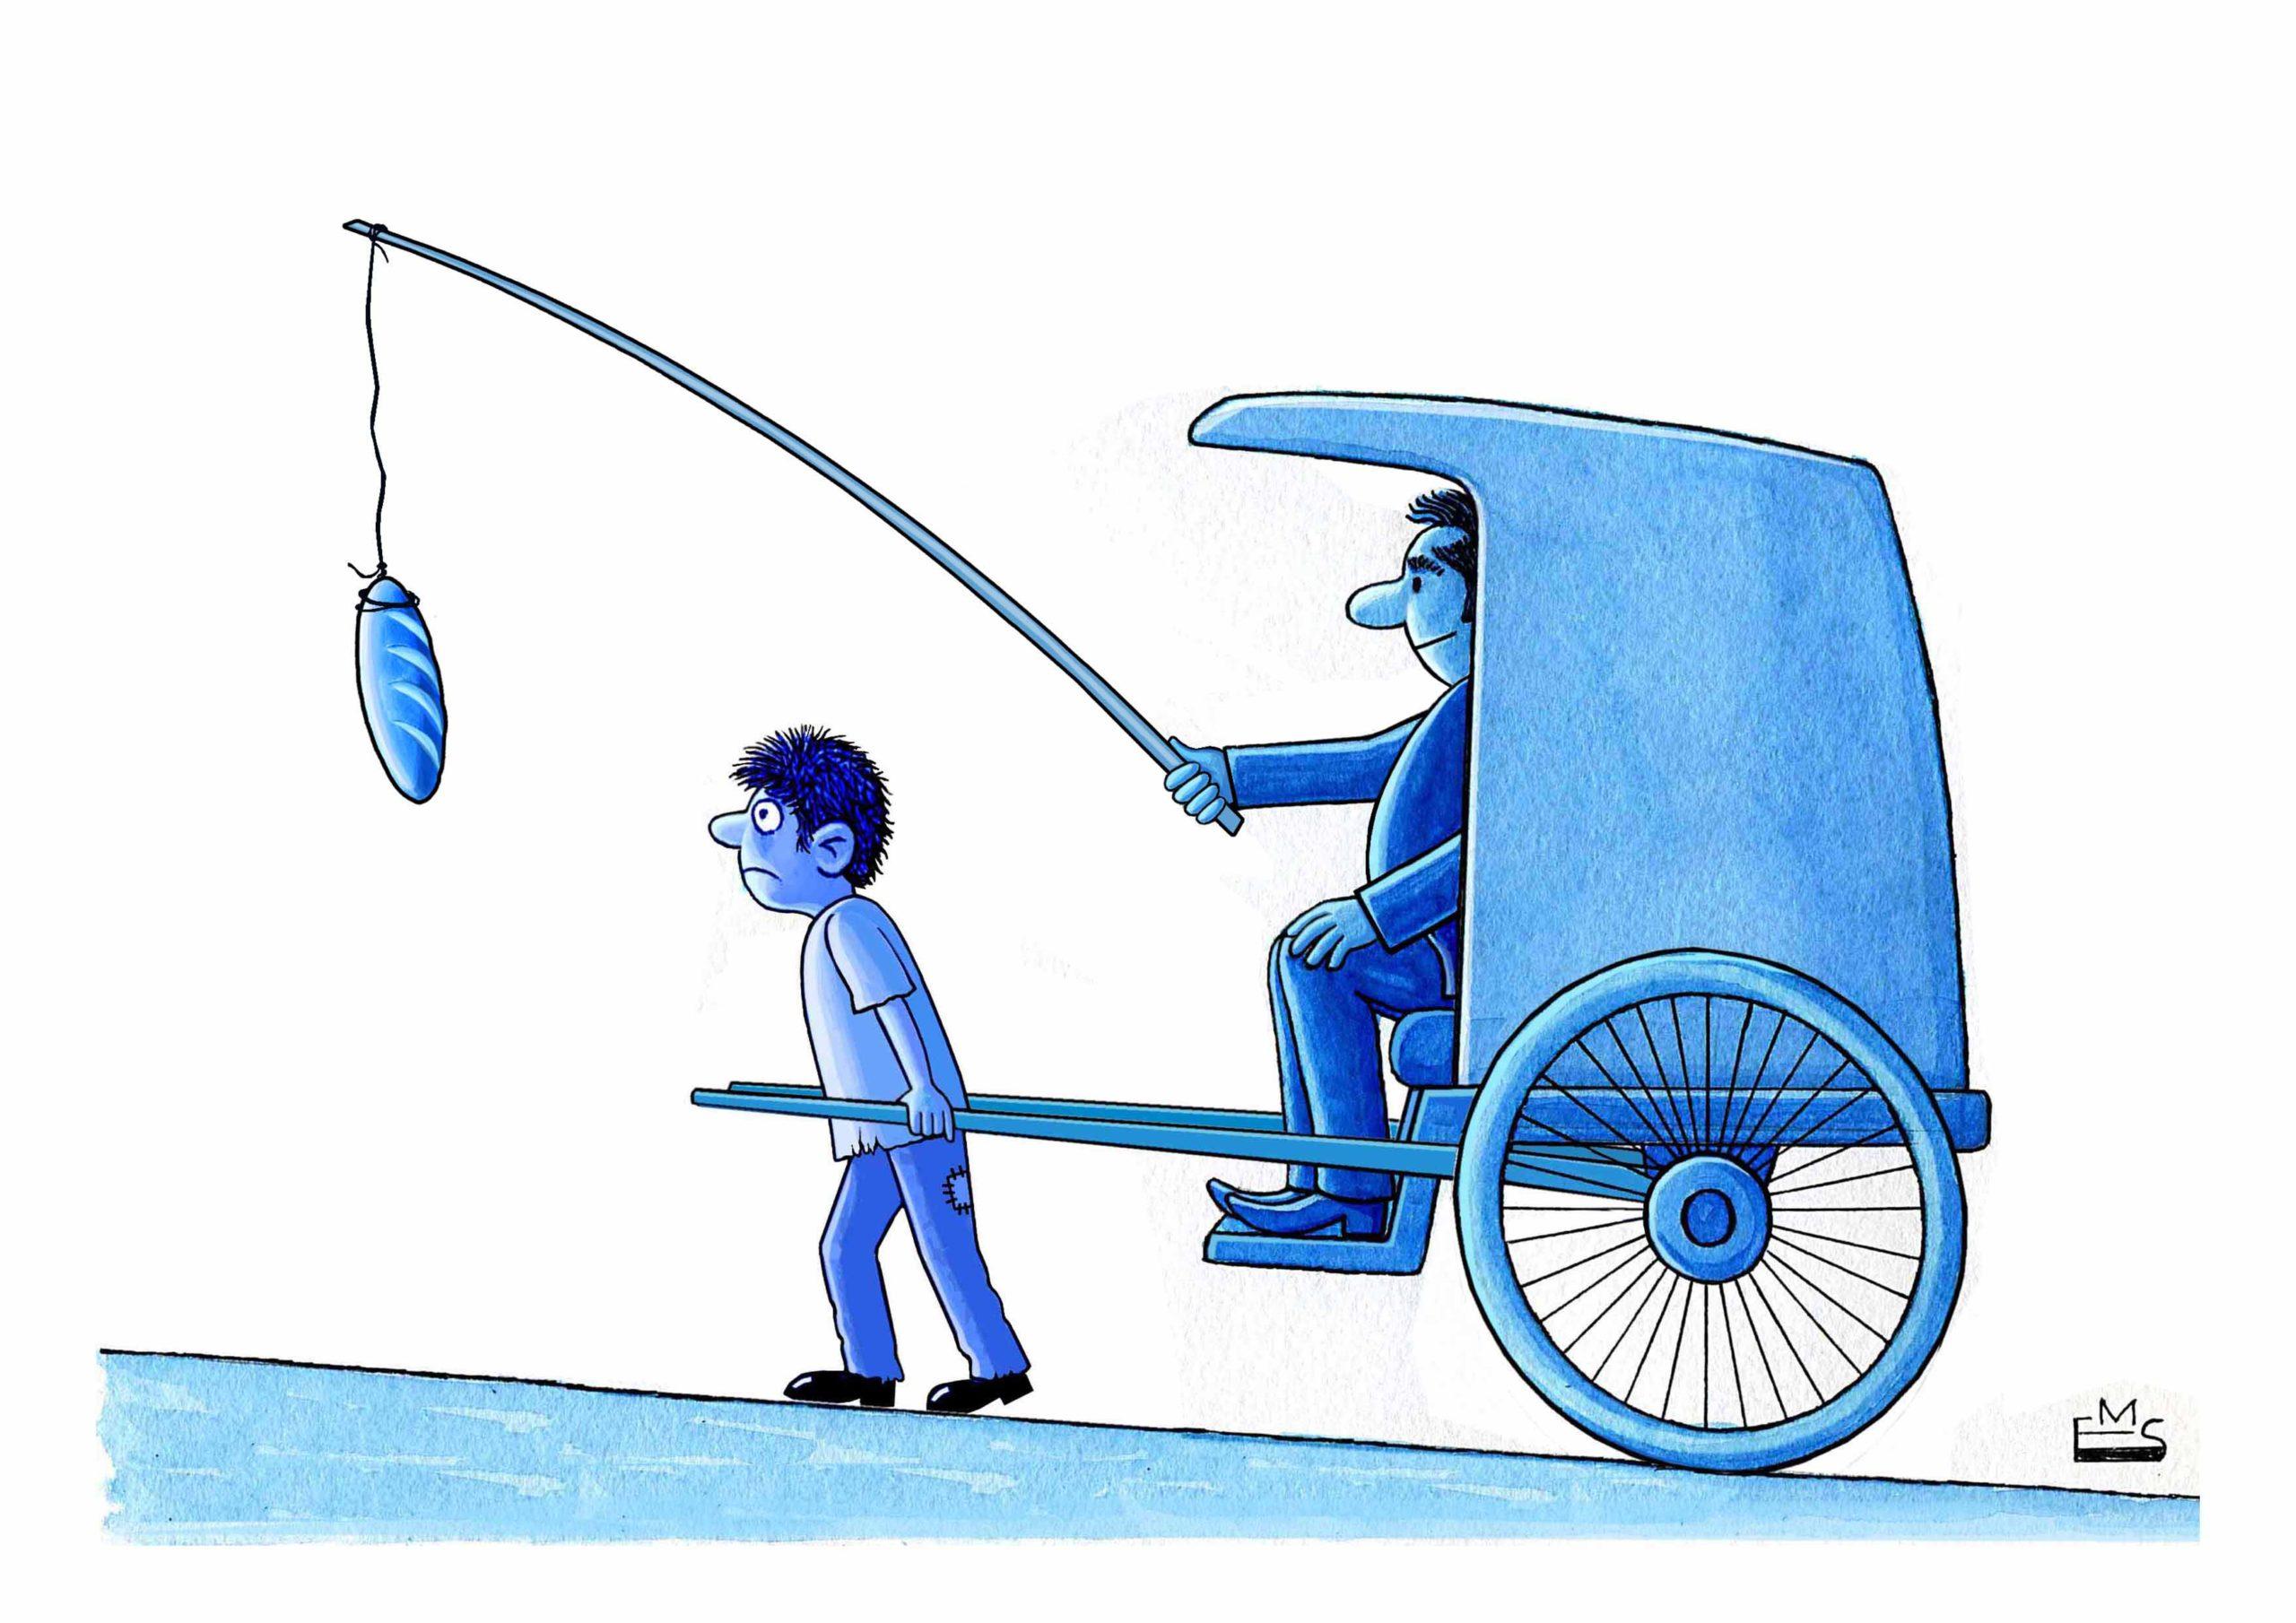 Eshonkulov Makhmudjon (Uzbekistan)_Cartooning for Peace